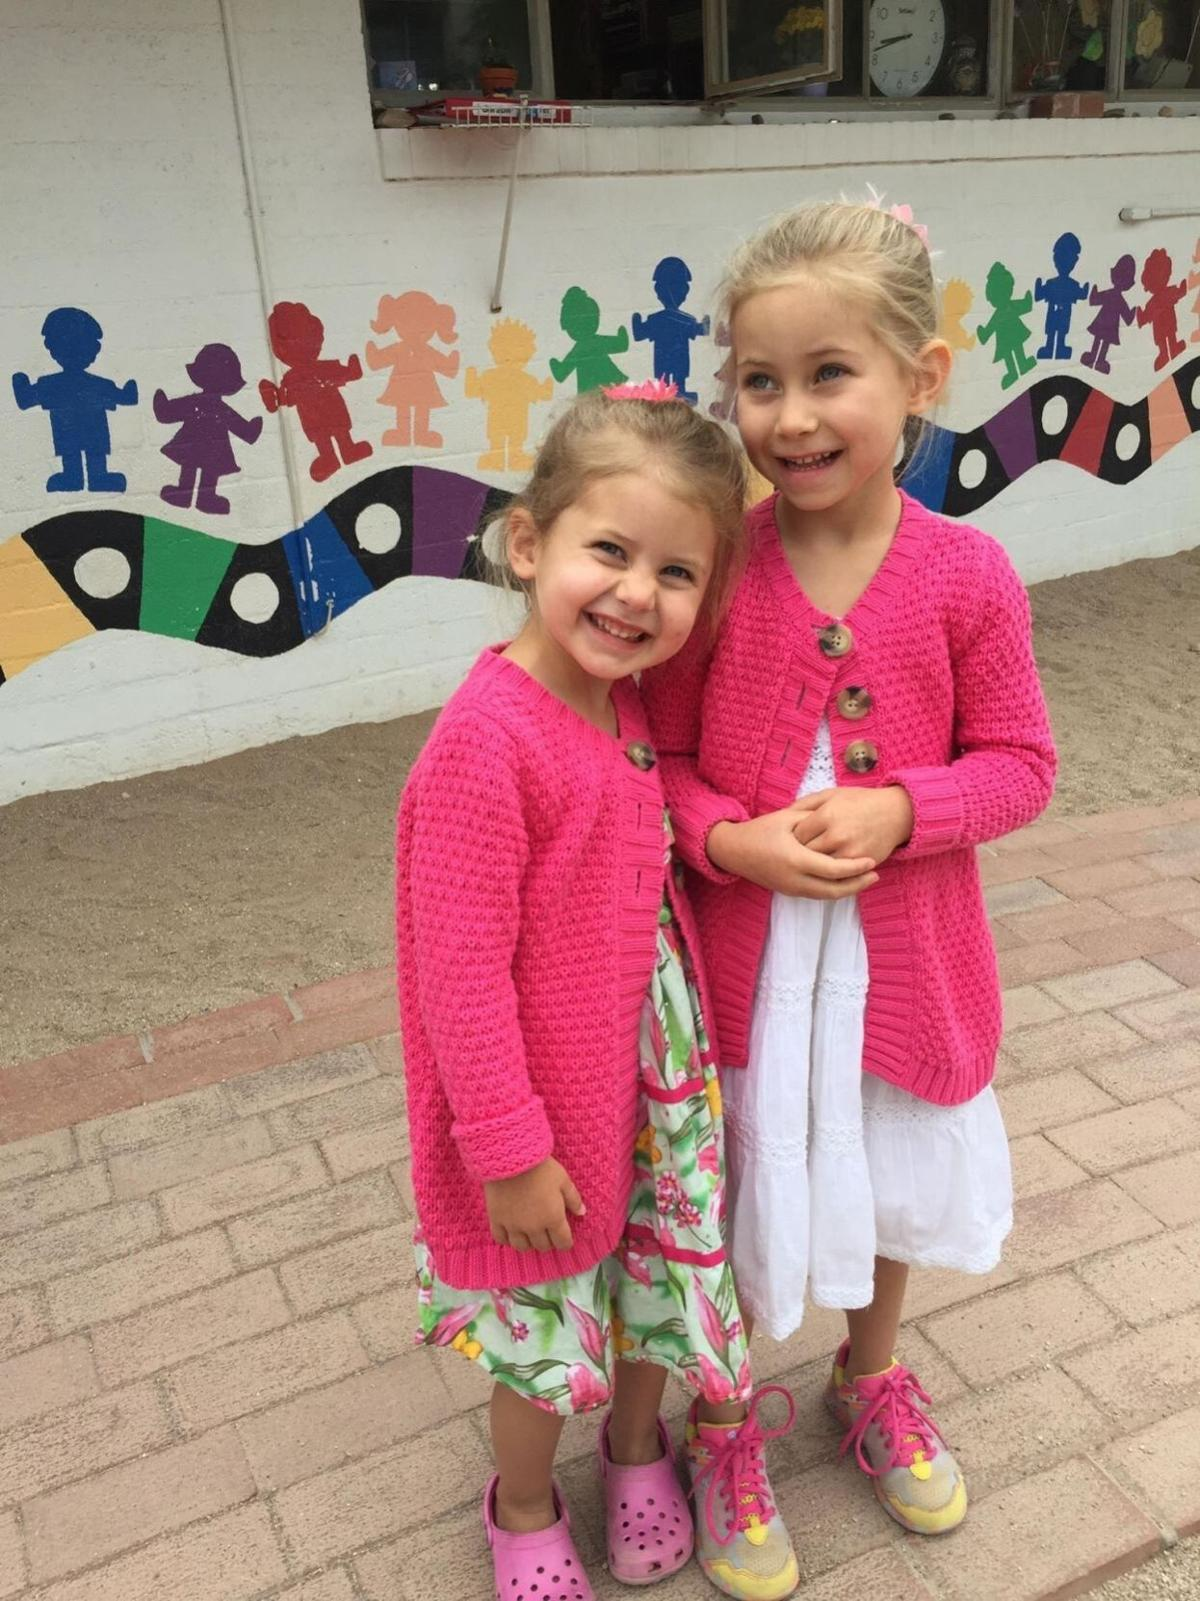 Elira and Sophia Novak outside of St. Mark's Preschool and Kindergarten